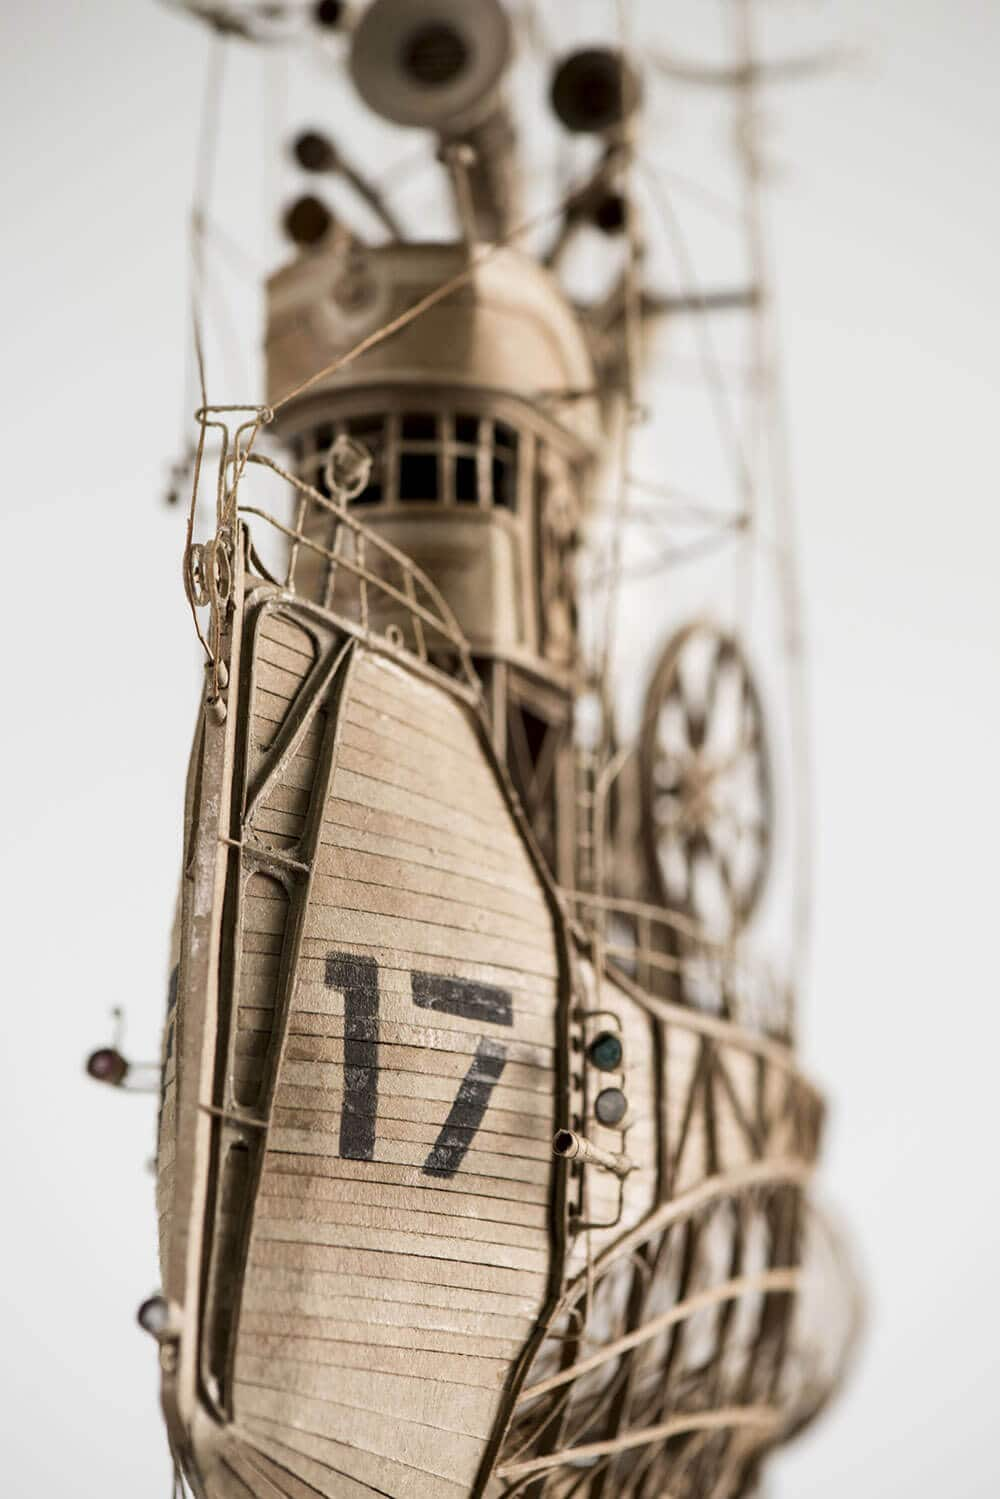 sculptural airships cardboard 4